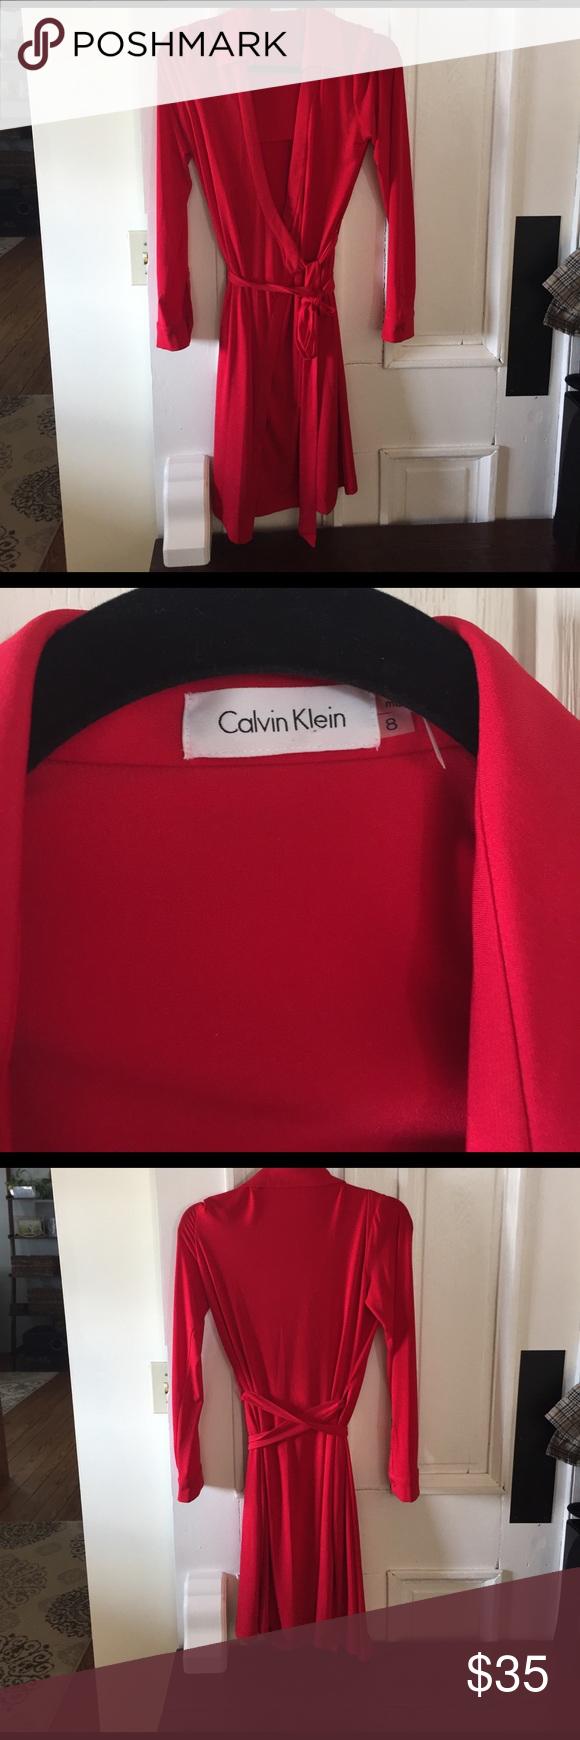 New calvin klein red wrap dress size red wrap dress wrap